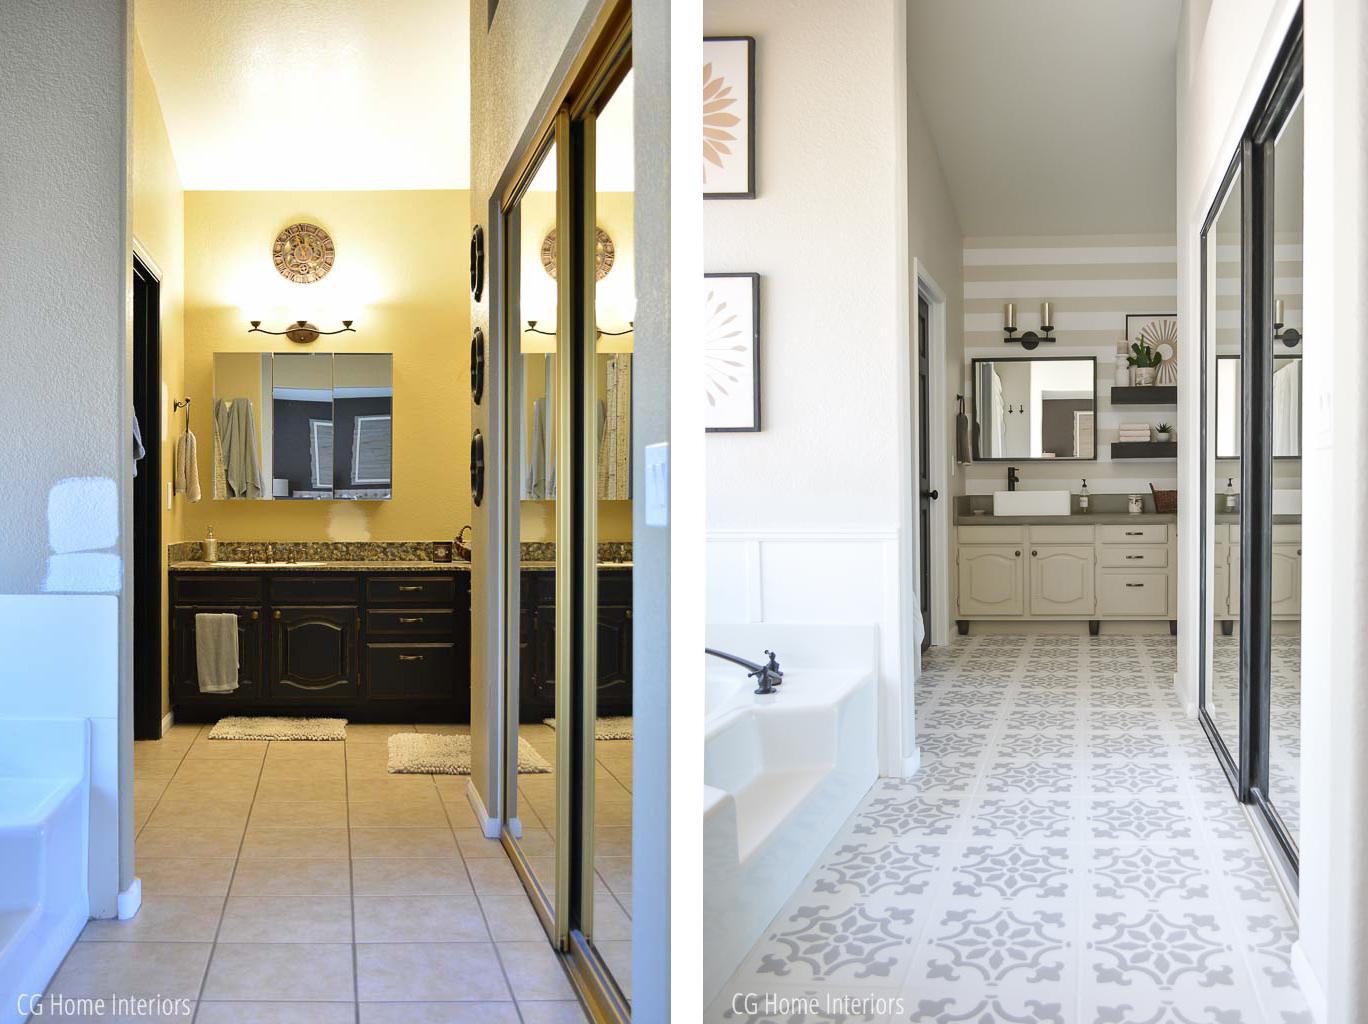 Builder Grade Bathroom Remodel Before and After